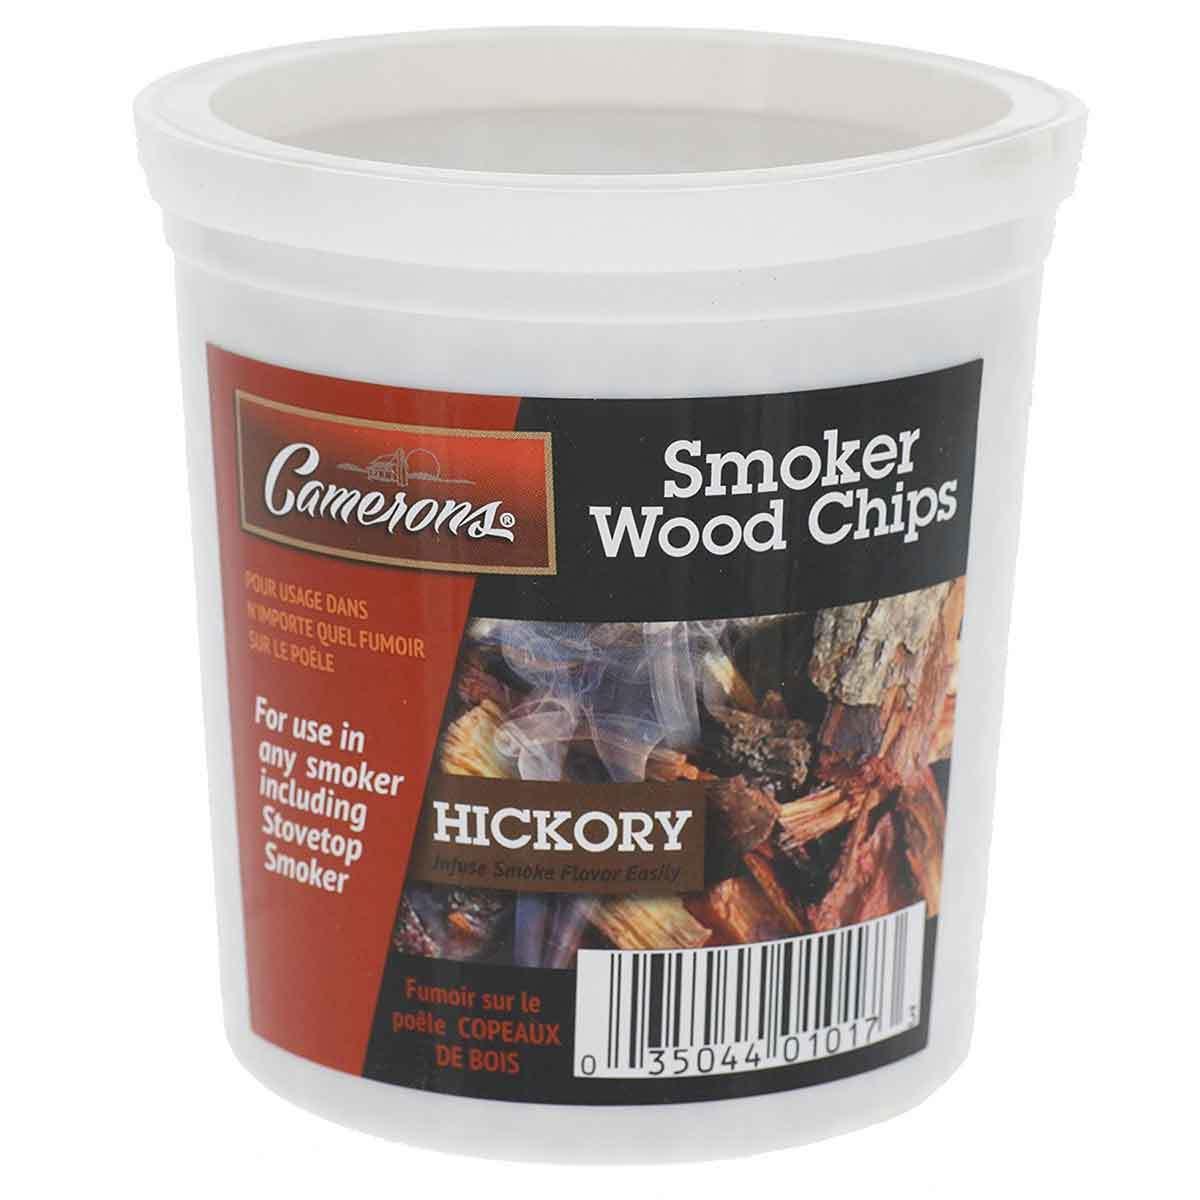 Camerons, Indoor Smoking Chip, Hickory